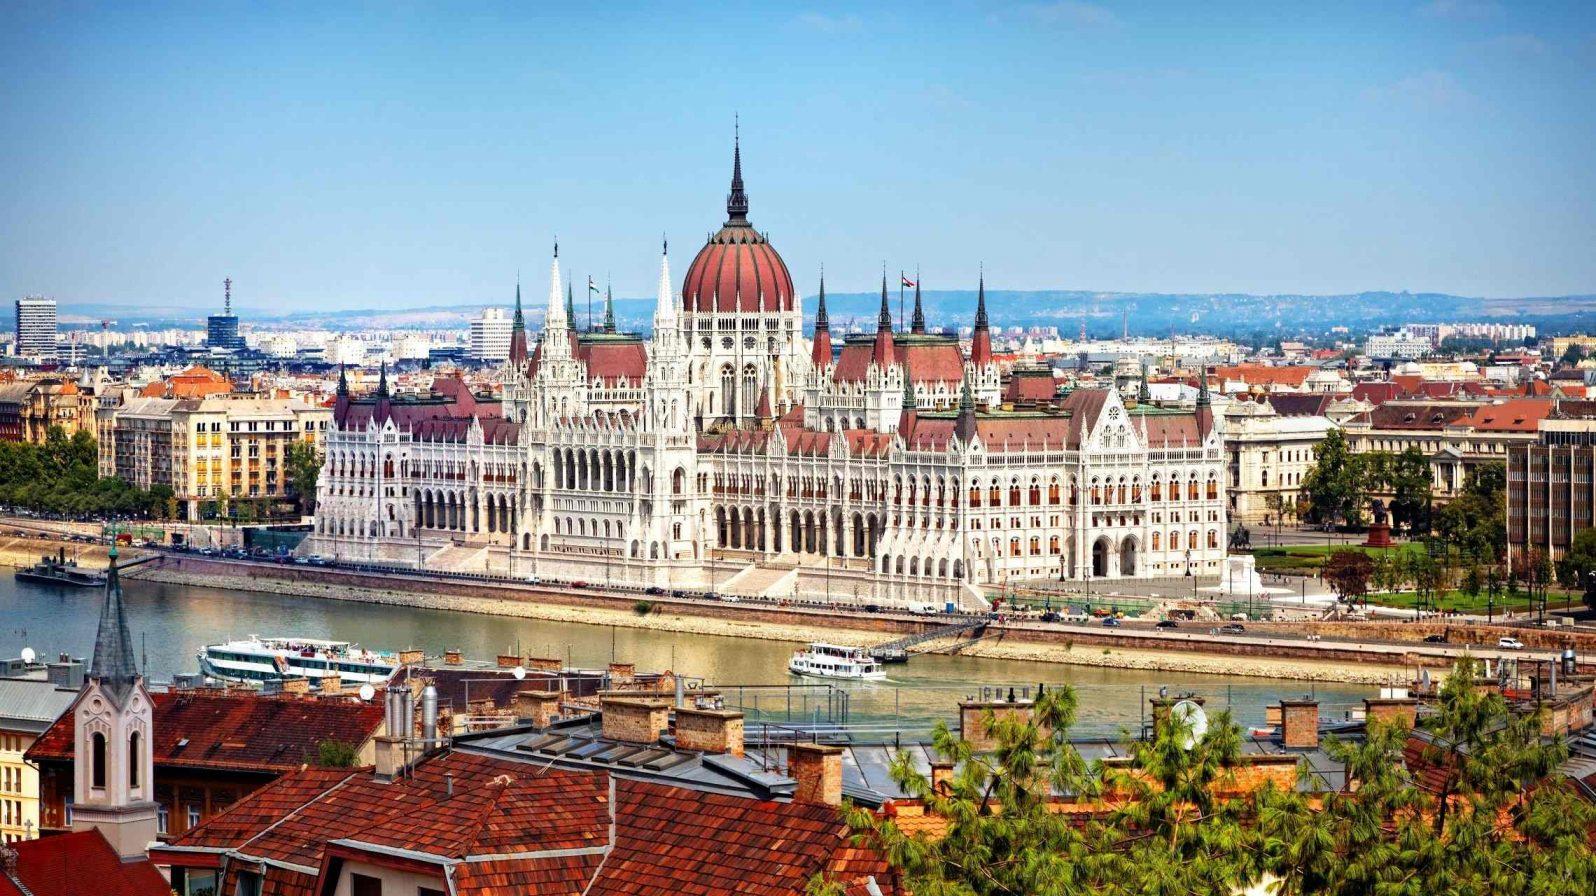 Budapest-Unkarin-parlamenttitalo-Unkari-1596x896.jpg